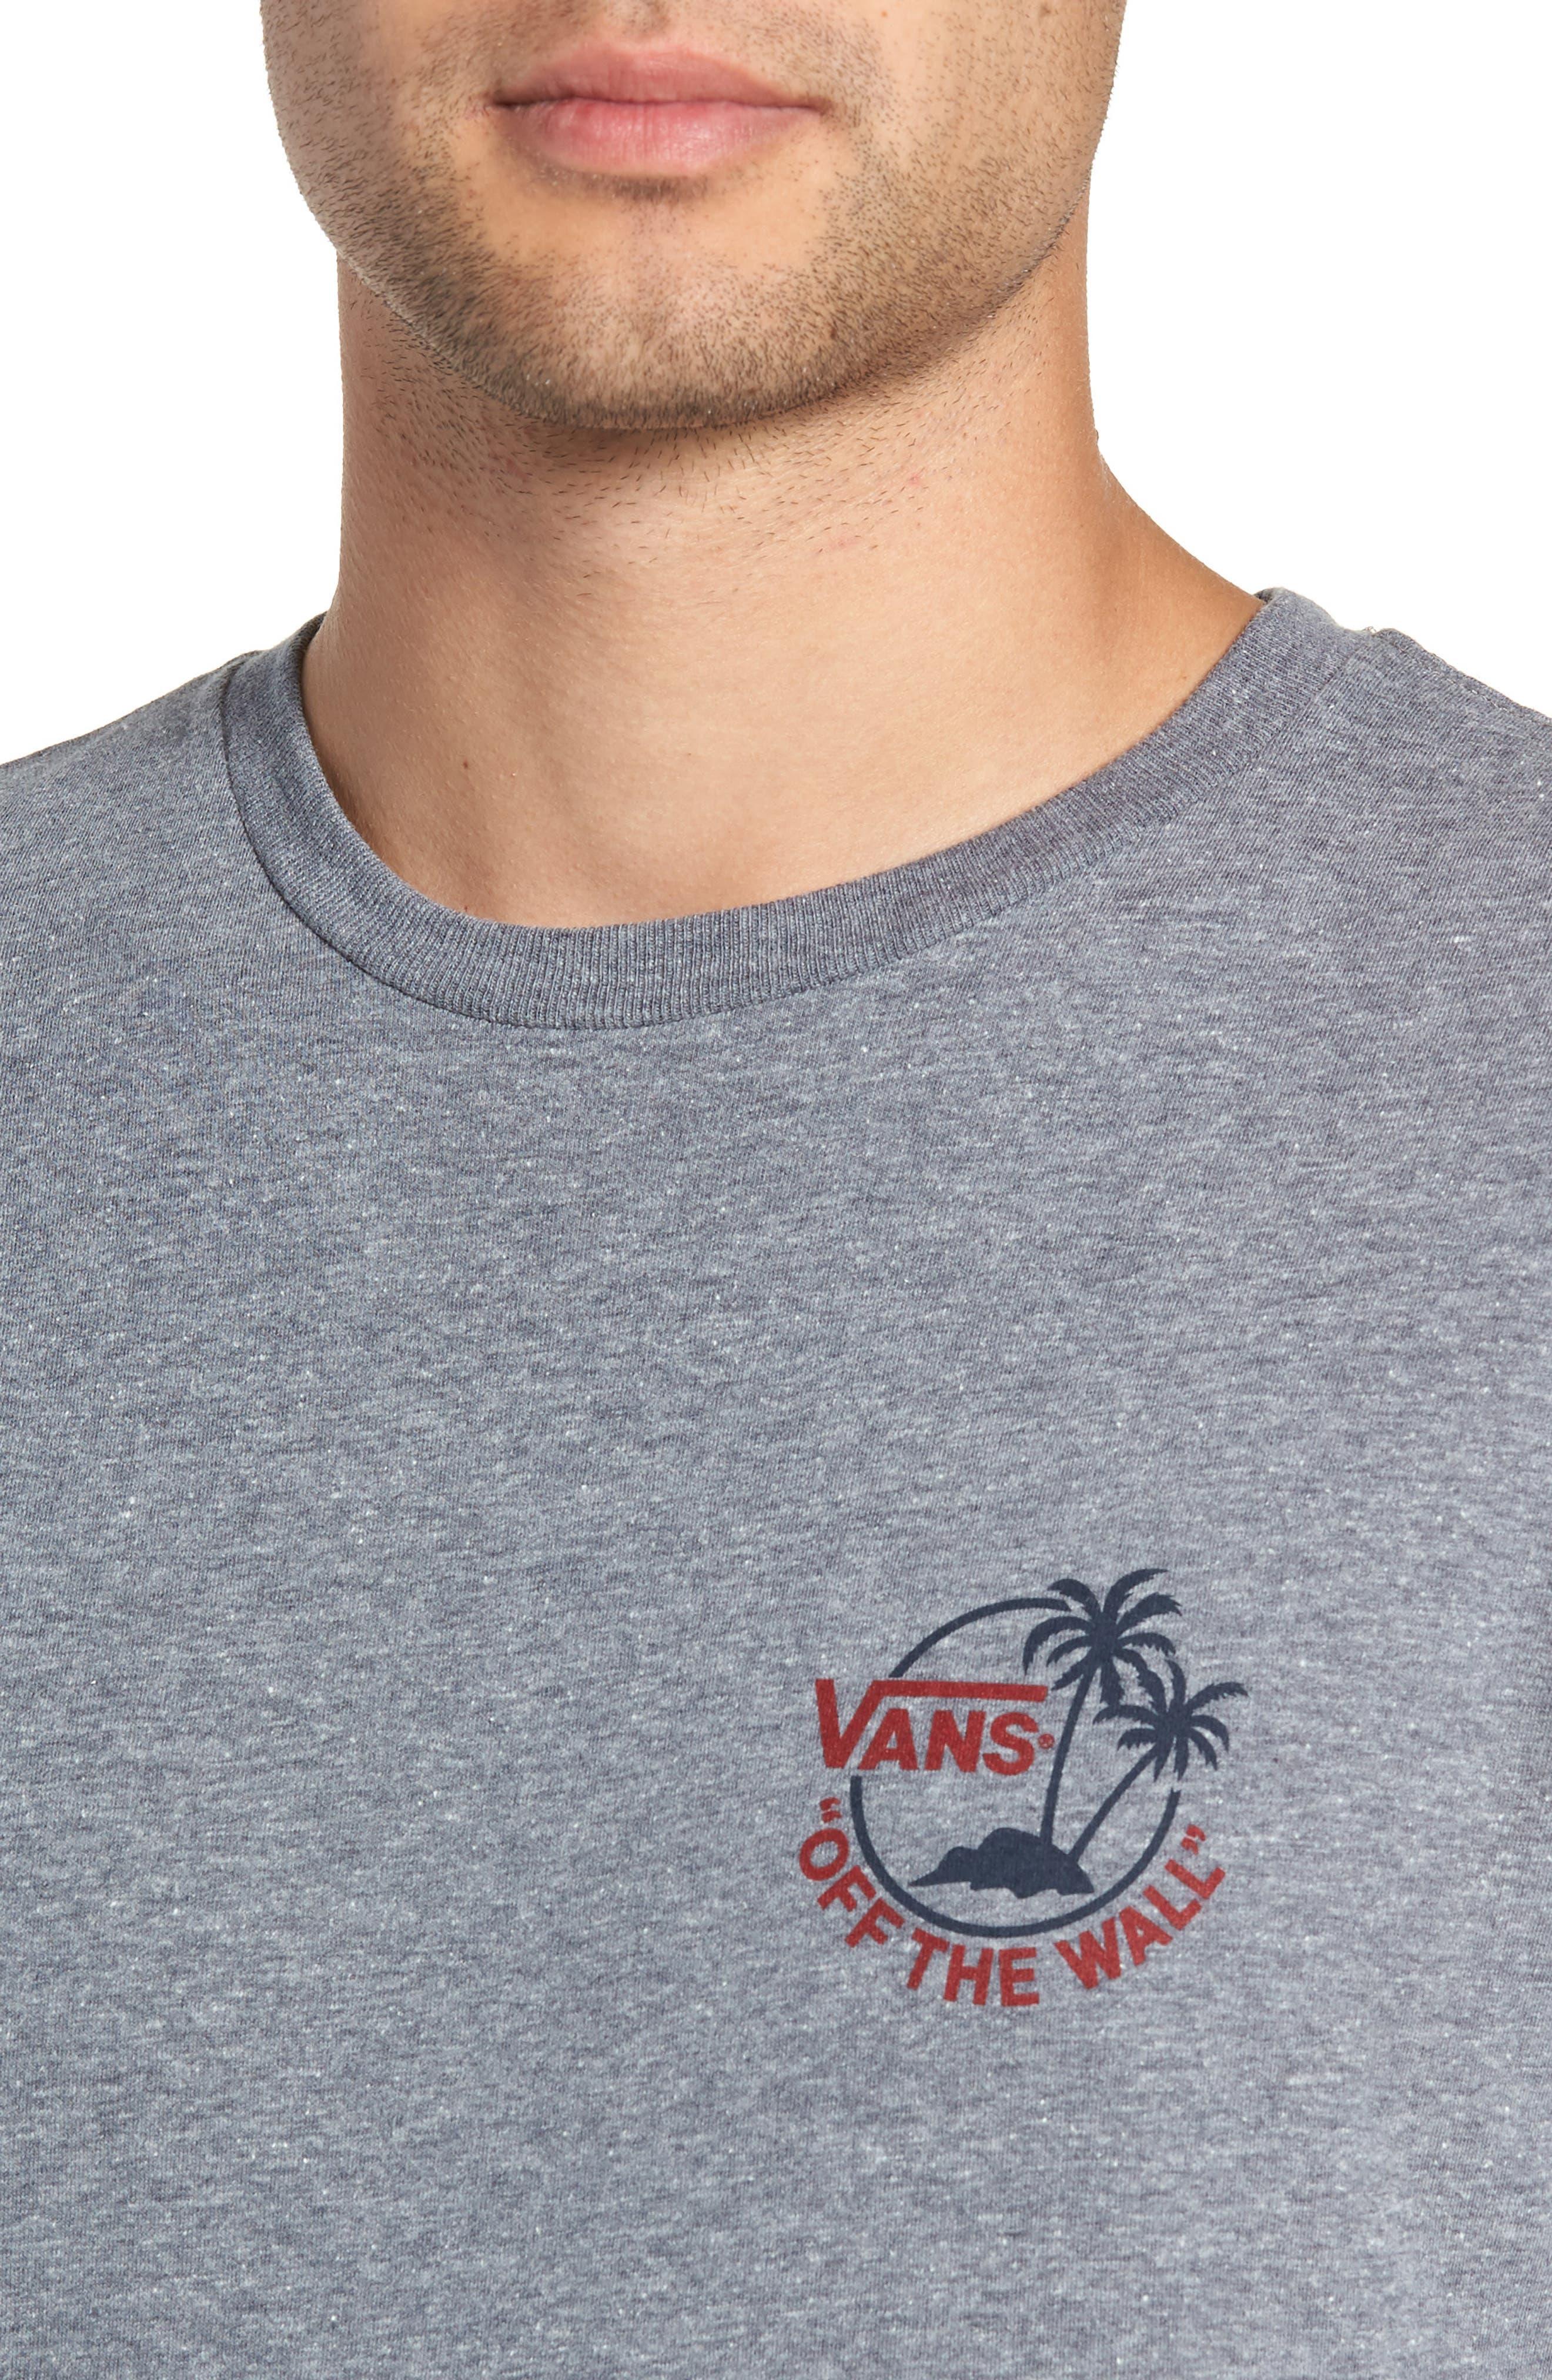 Mini Dual Palm III T-Shirt,                             Alternate thumbnail 4, color,                             HEATHER GREY/ CHILI PEPPER